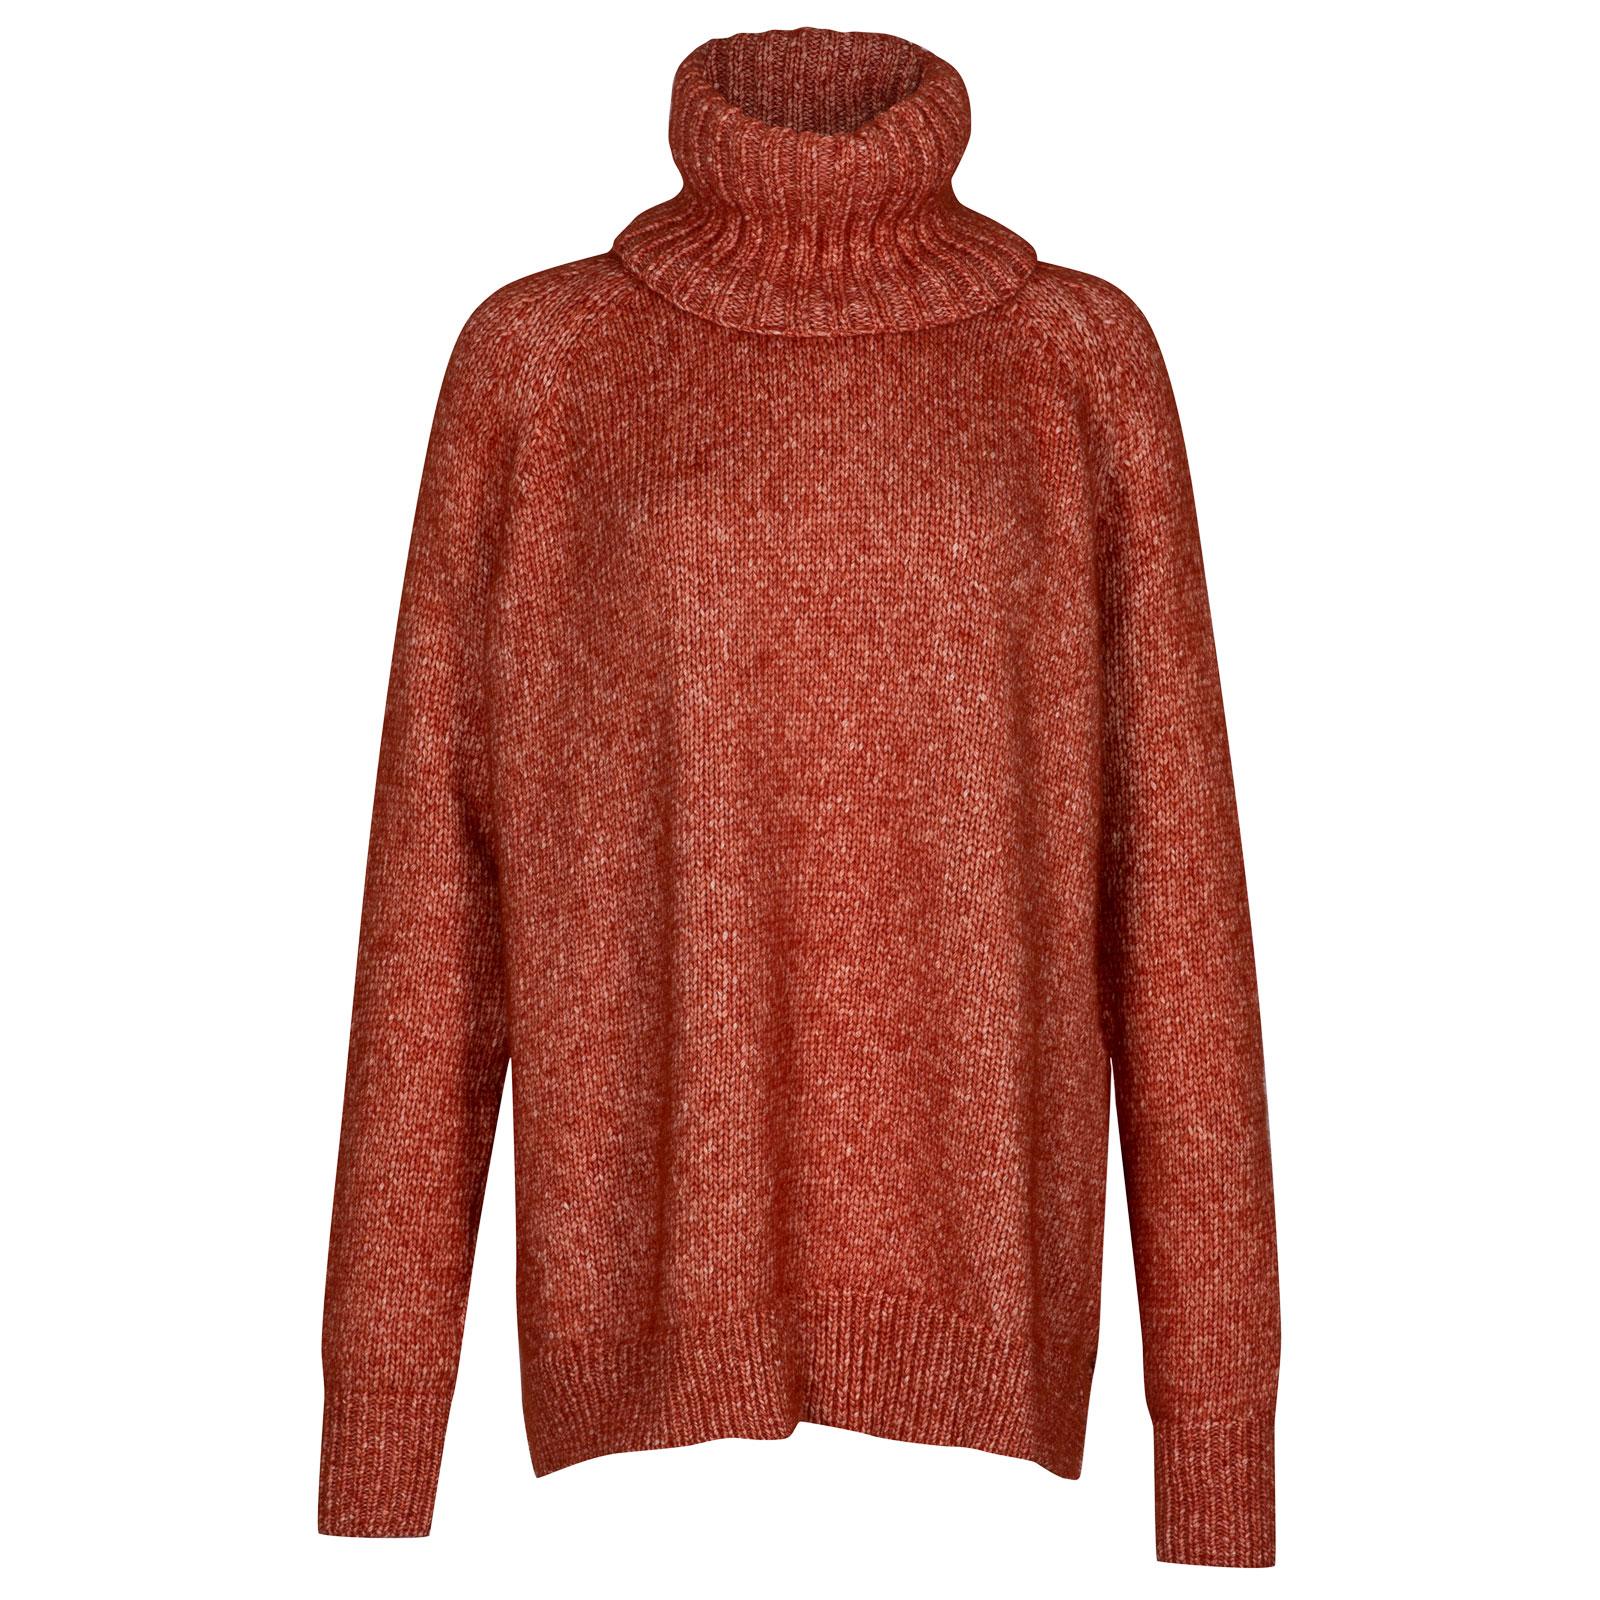 John Smedley Morar Alpaca, Wool & Cotton Sweater in Flare Orange-L